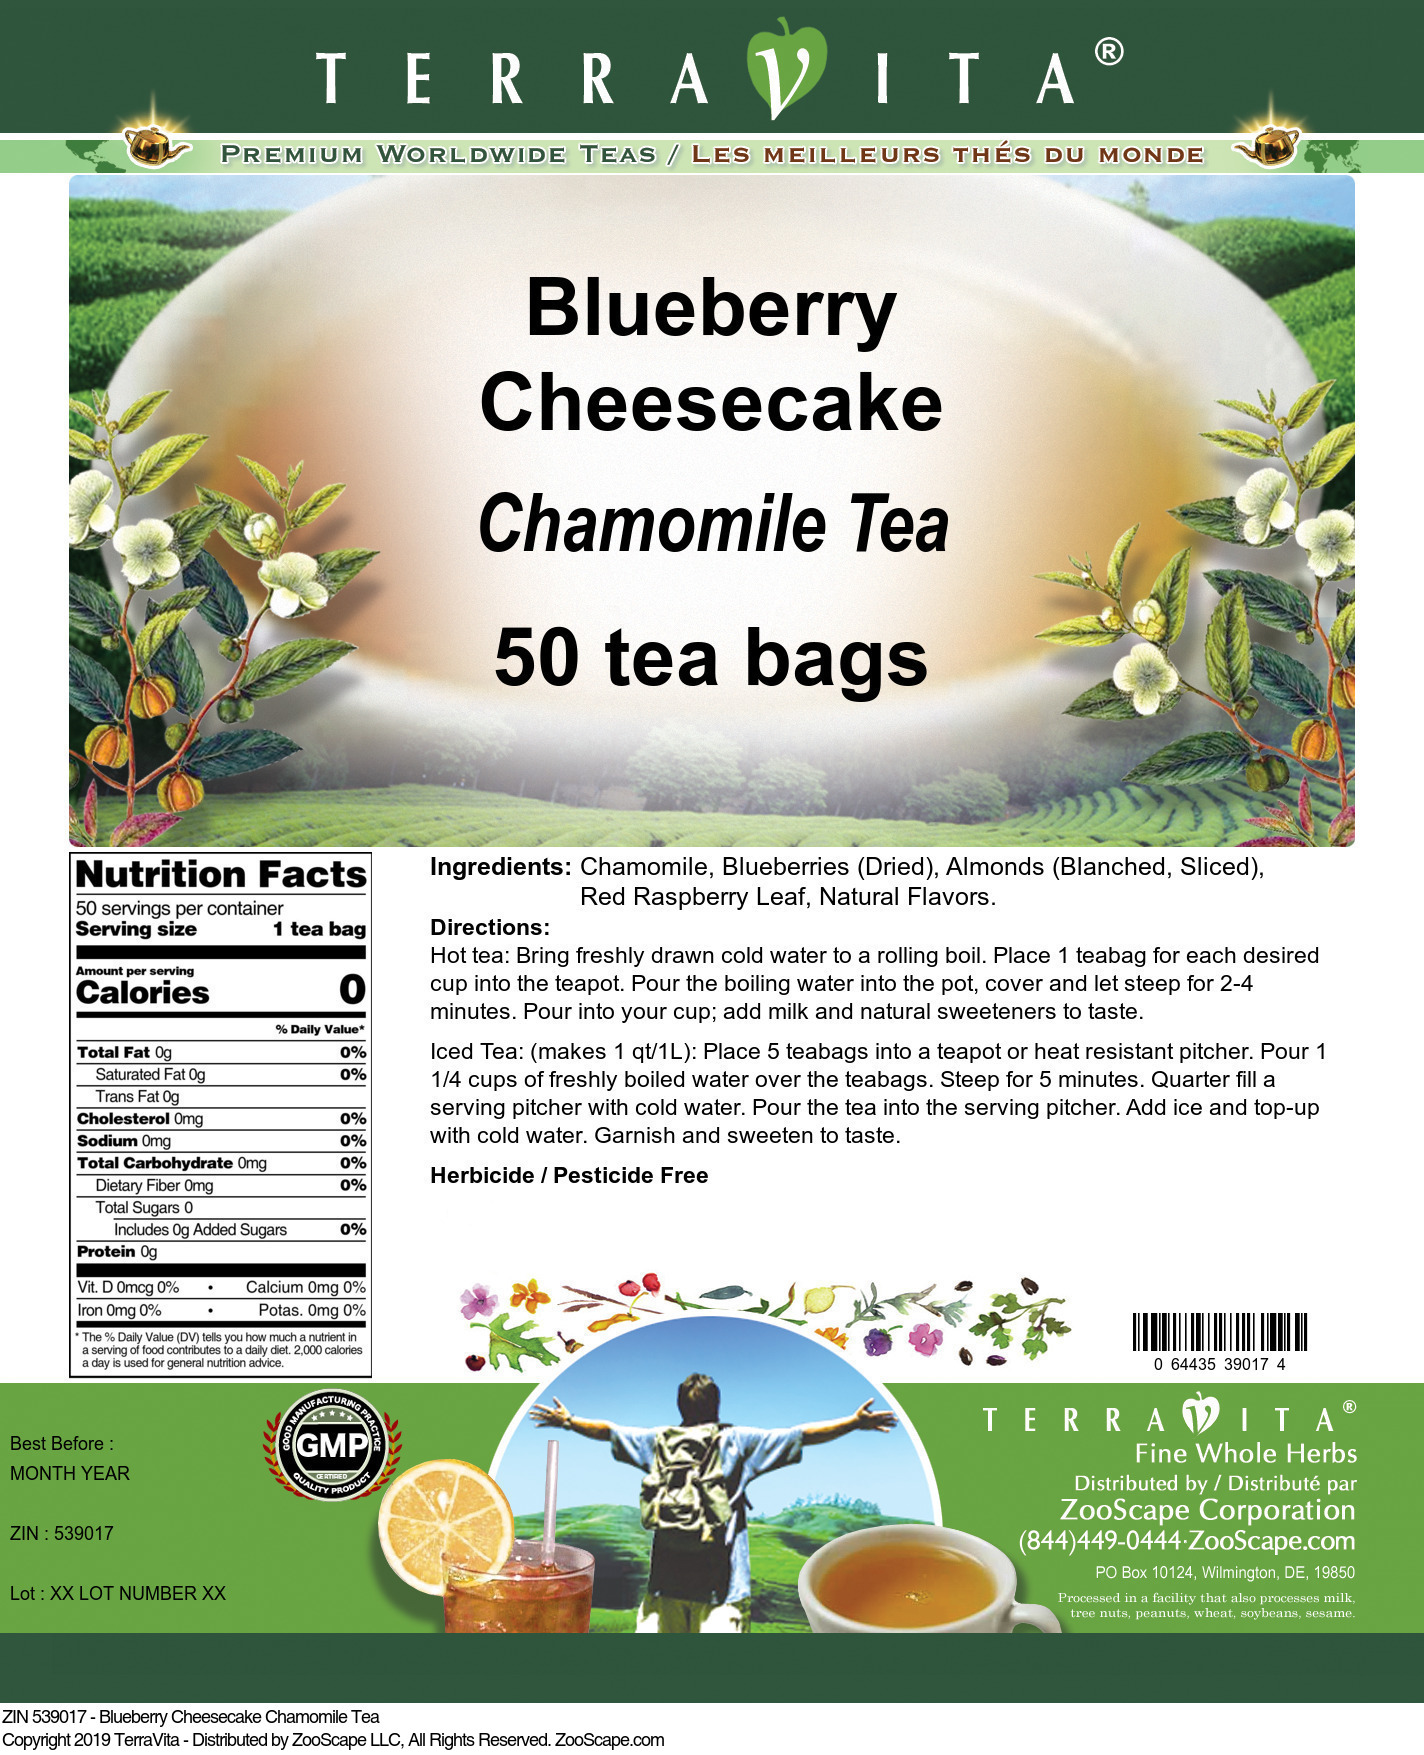 Blueberry Cheesecake Chamomile Tea